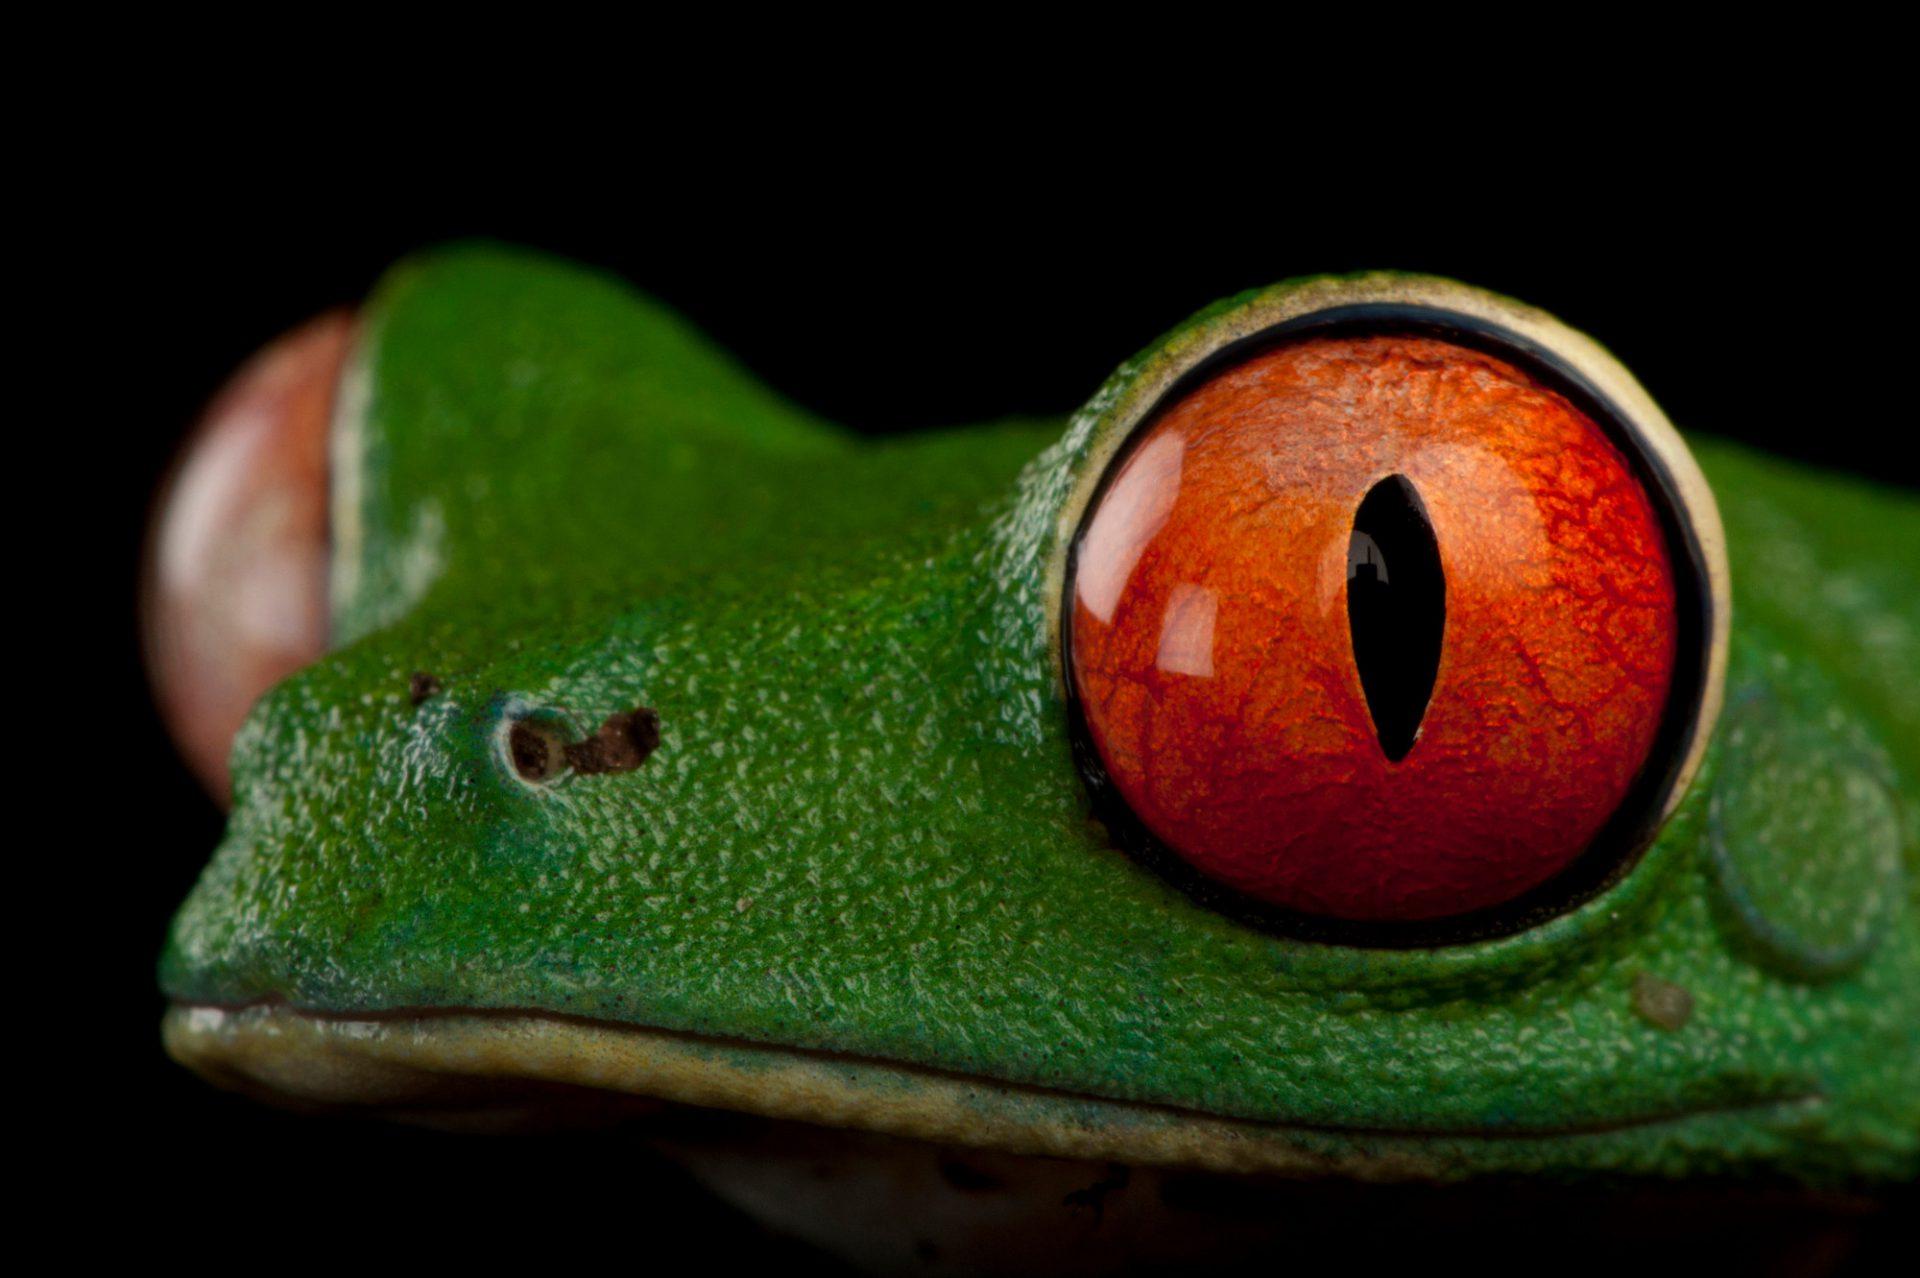 Red-eyed tree frog (Agalychnis callidryas) at the Miller Park Zoo.